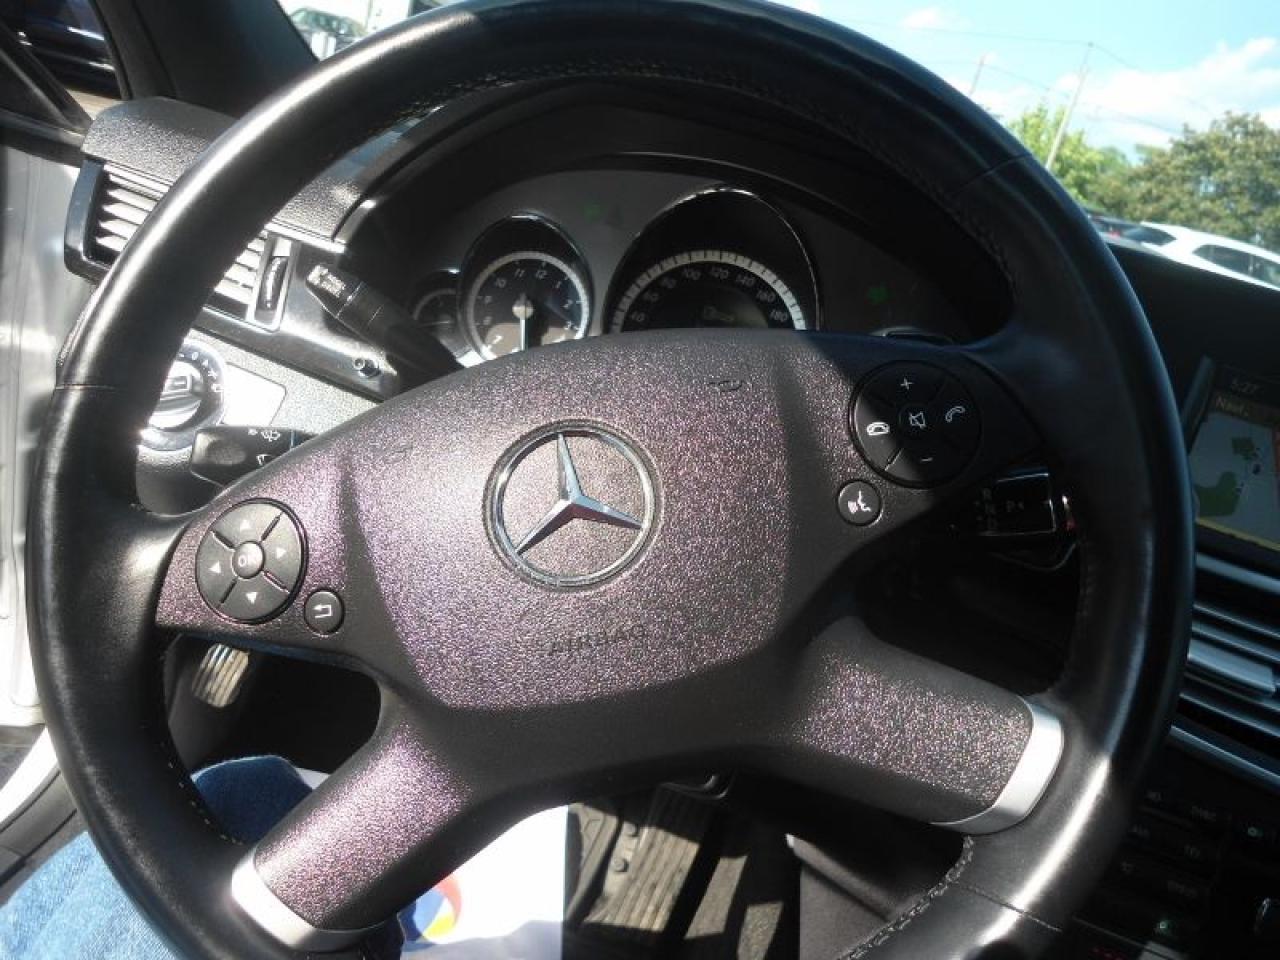 2010 Mercedes-Benz E-Class 4dr Sdn E 350 4MATIC NAVIGATION PANORAMINC ROOF 1